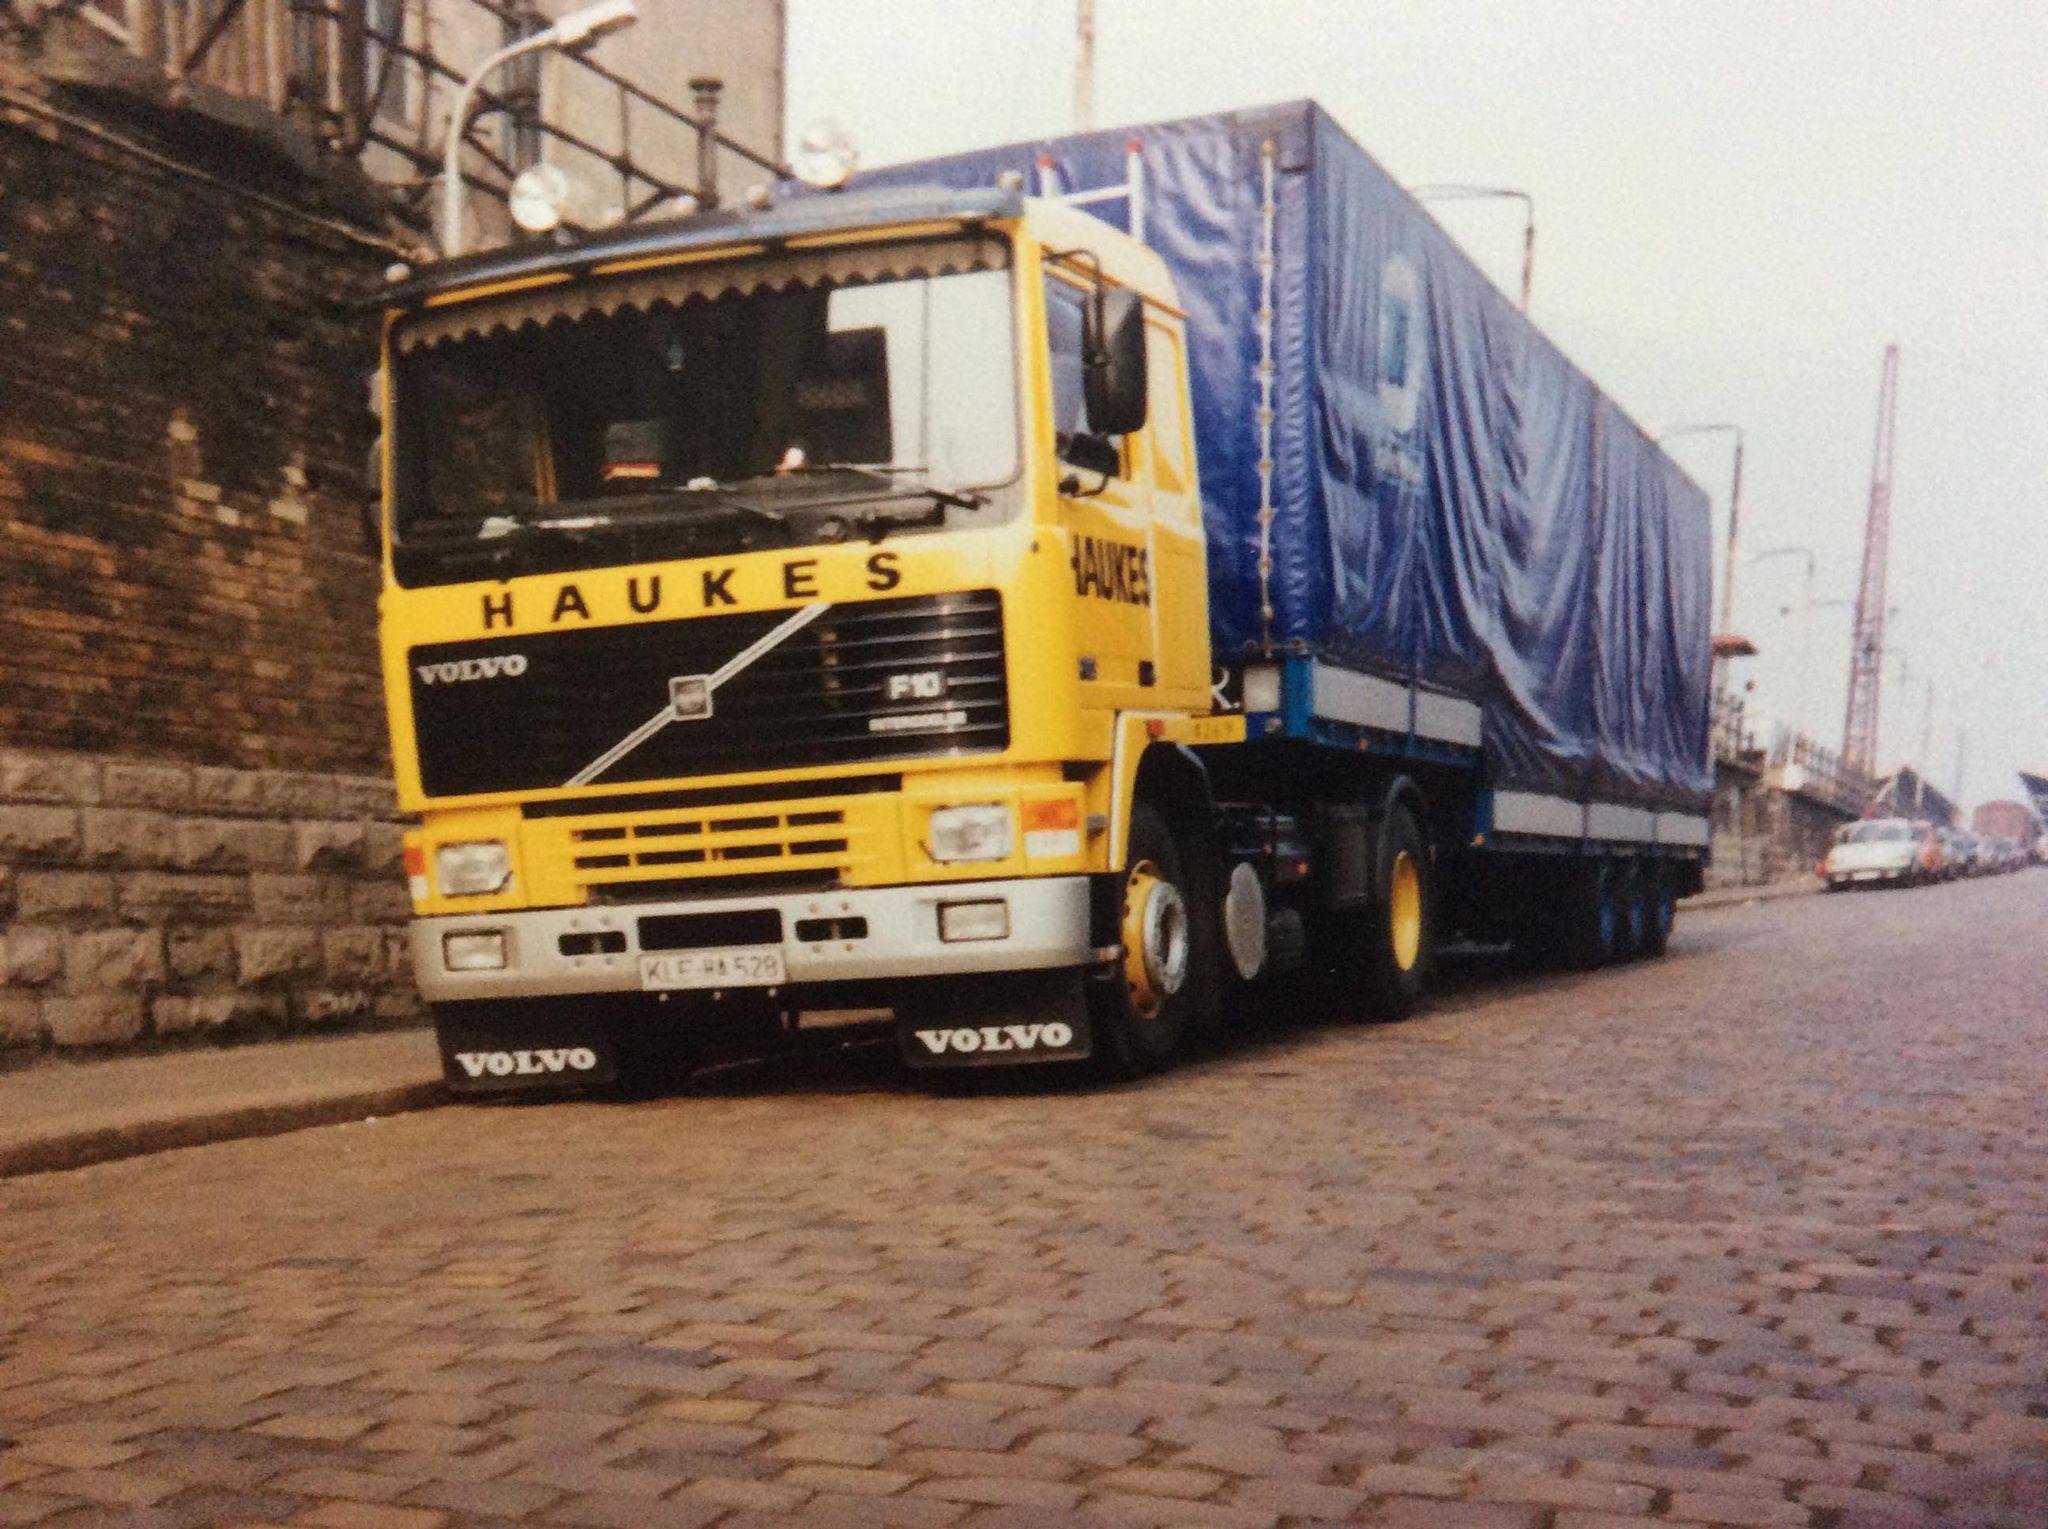 Volvo-Henk-Schmitjes-foto-archief-32